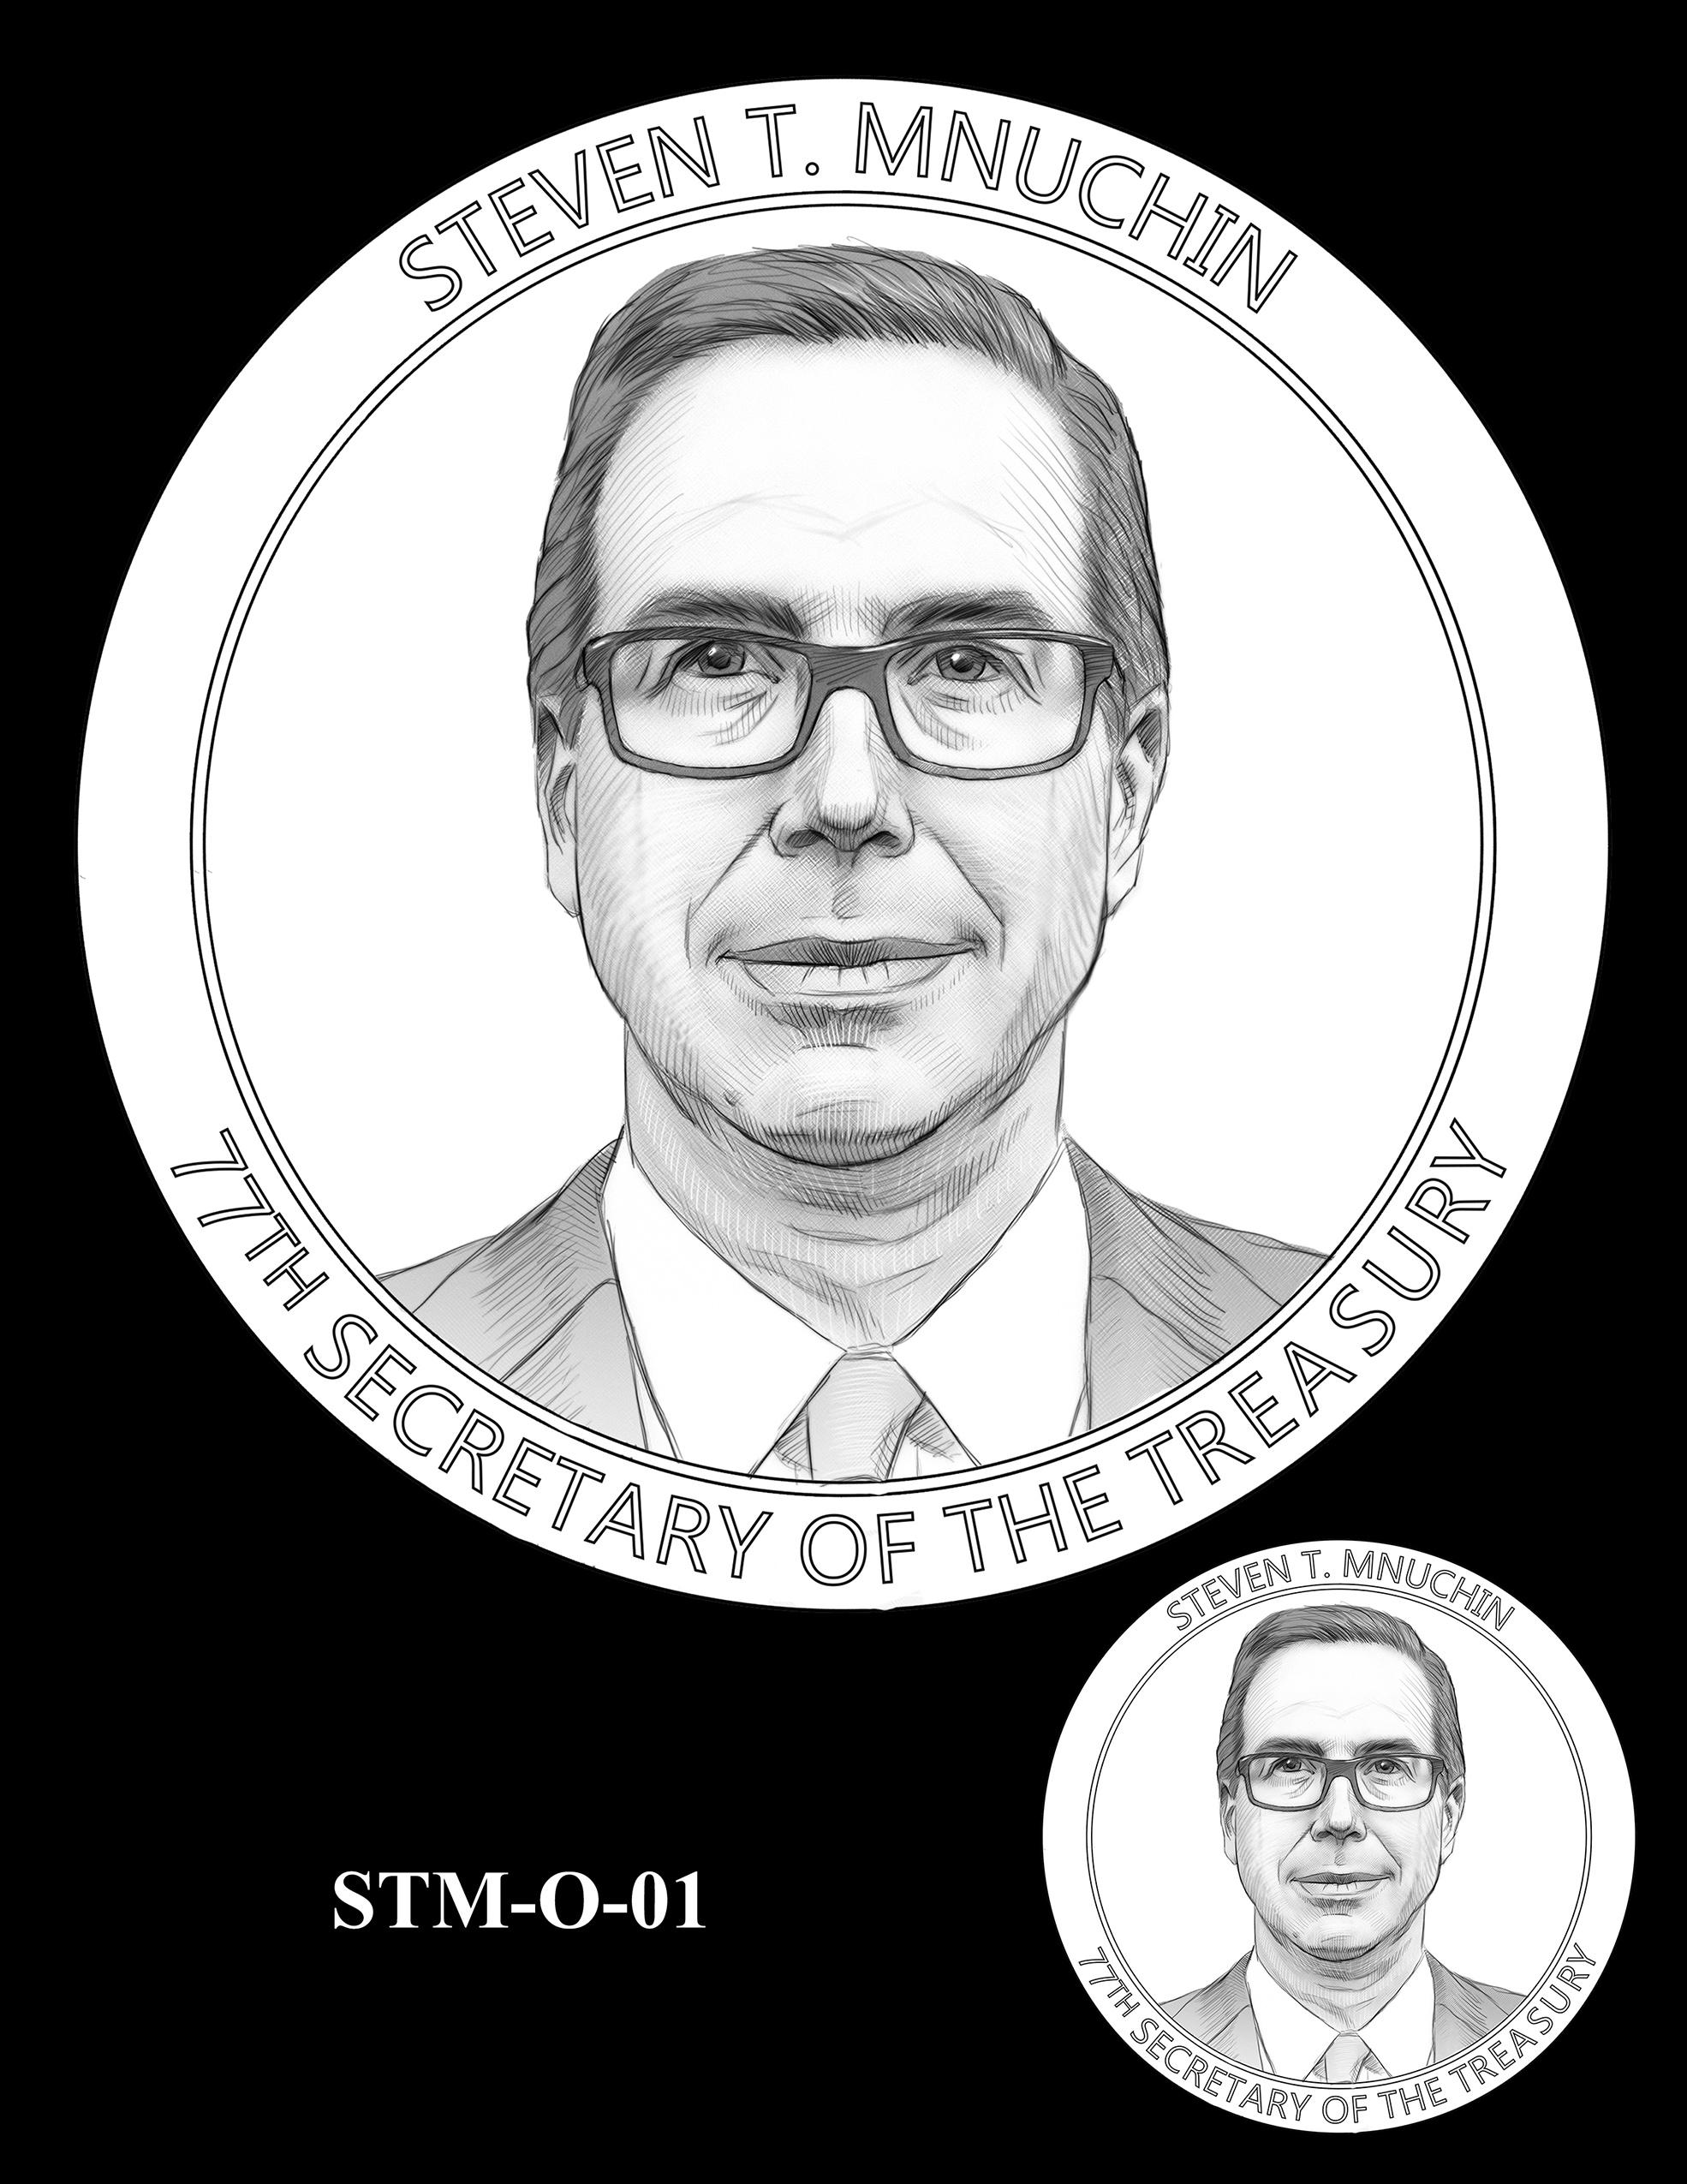 STM-O-01 -- Steven T. Mnuchin Secretary of the Treasury Medal